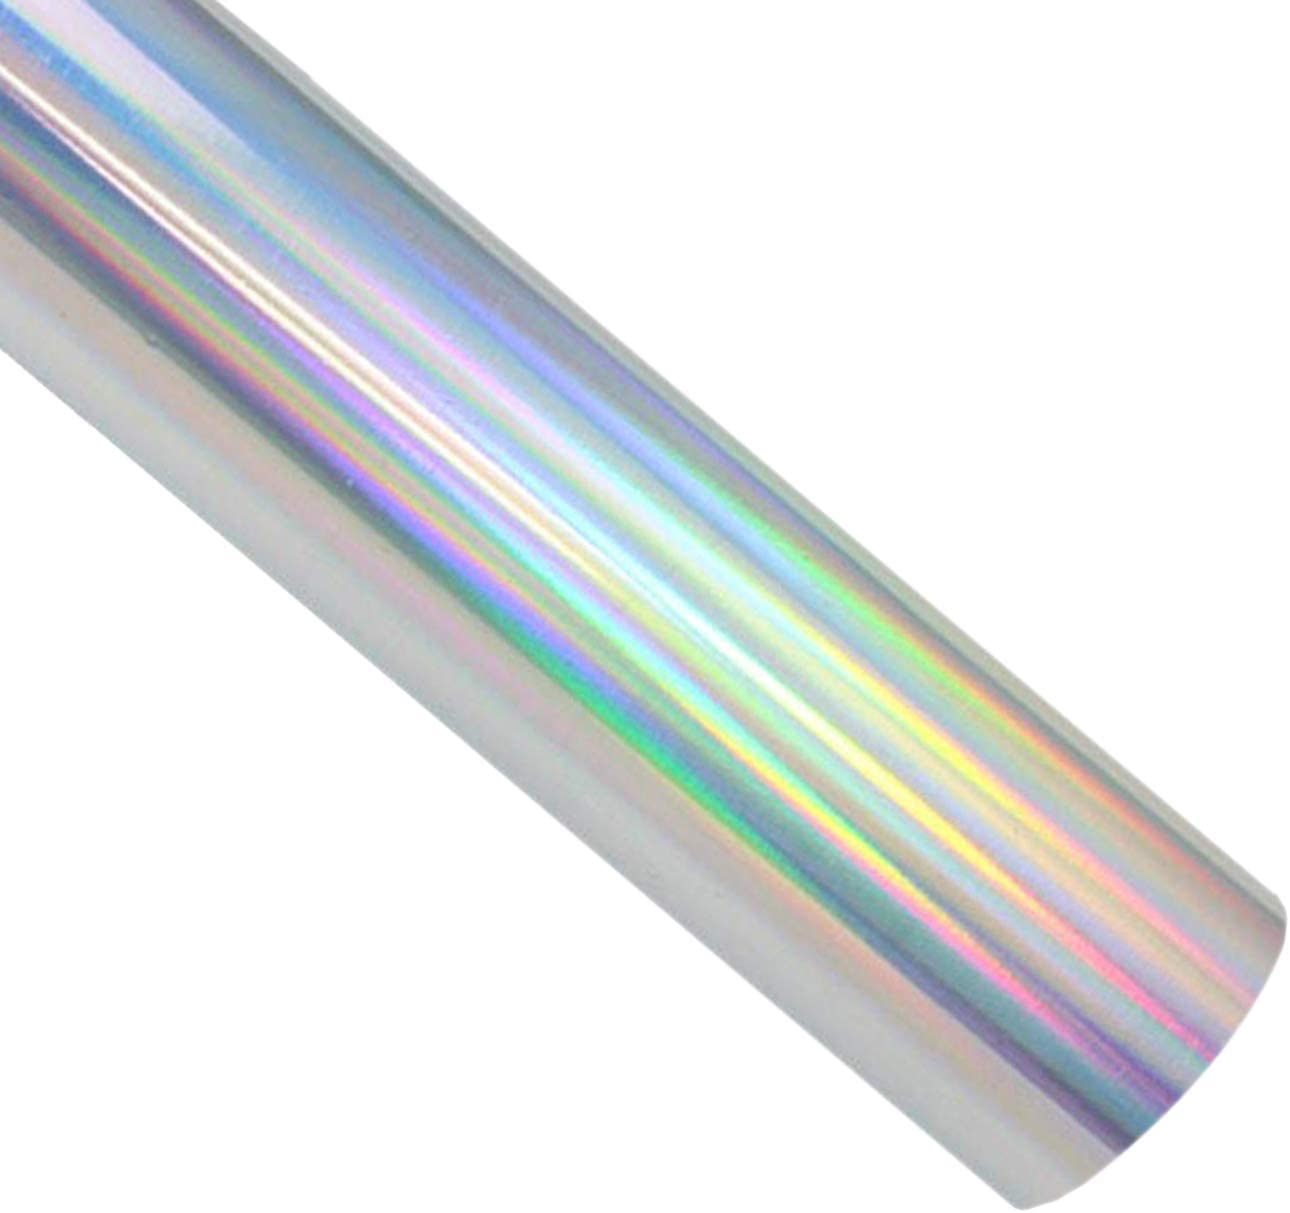 WATINC 6Pcs Glitter Heat Transfer Vinyl HTV Sheets DIY Handmade HTV Rainbow Transfer Paper Iron On Vinyl Starter Pack Silhouette Cameo HTV Heat Press Vinyl Decoratation for T-Shirts Hats Clothing